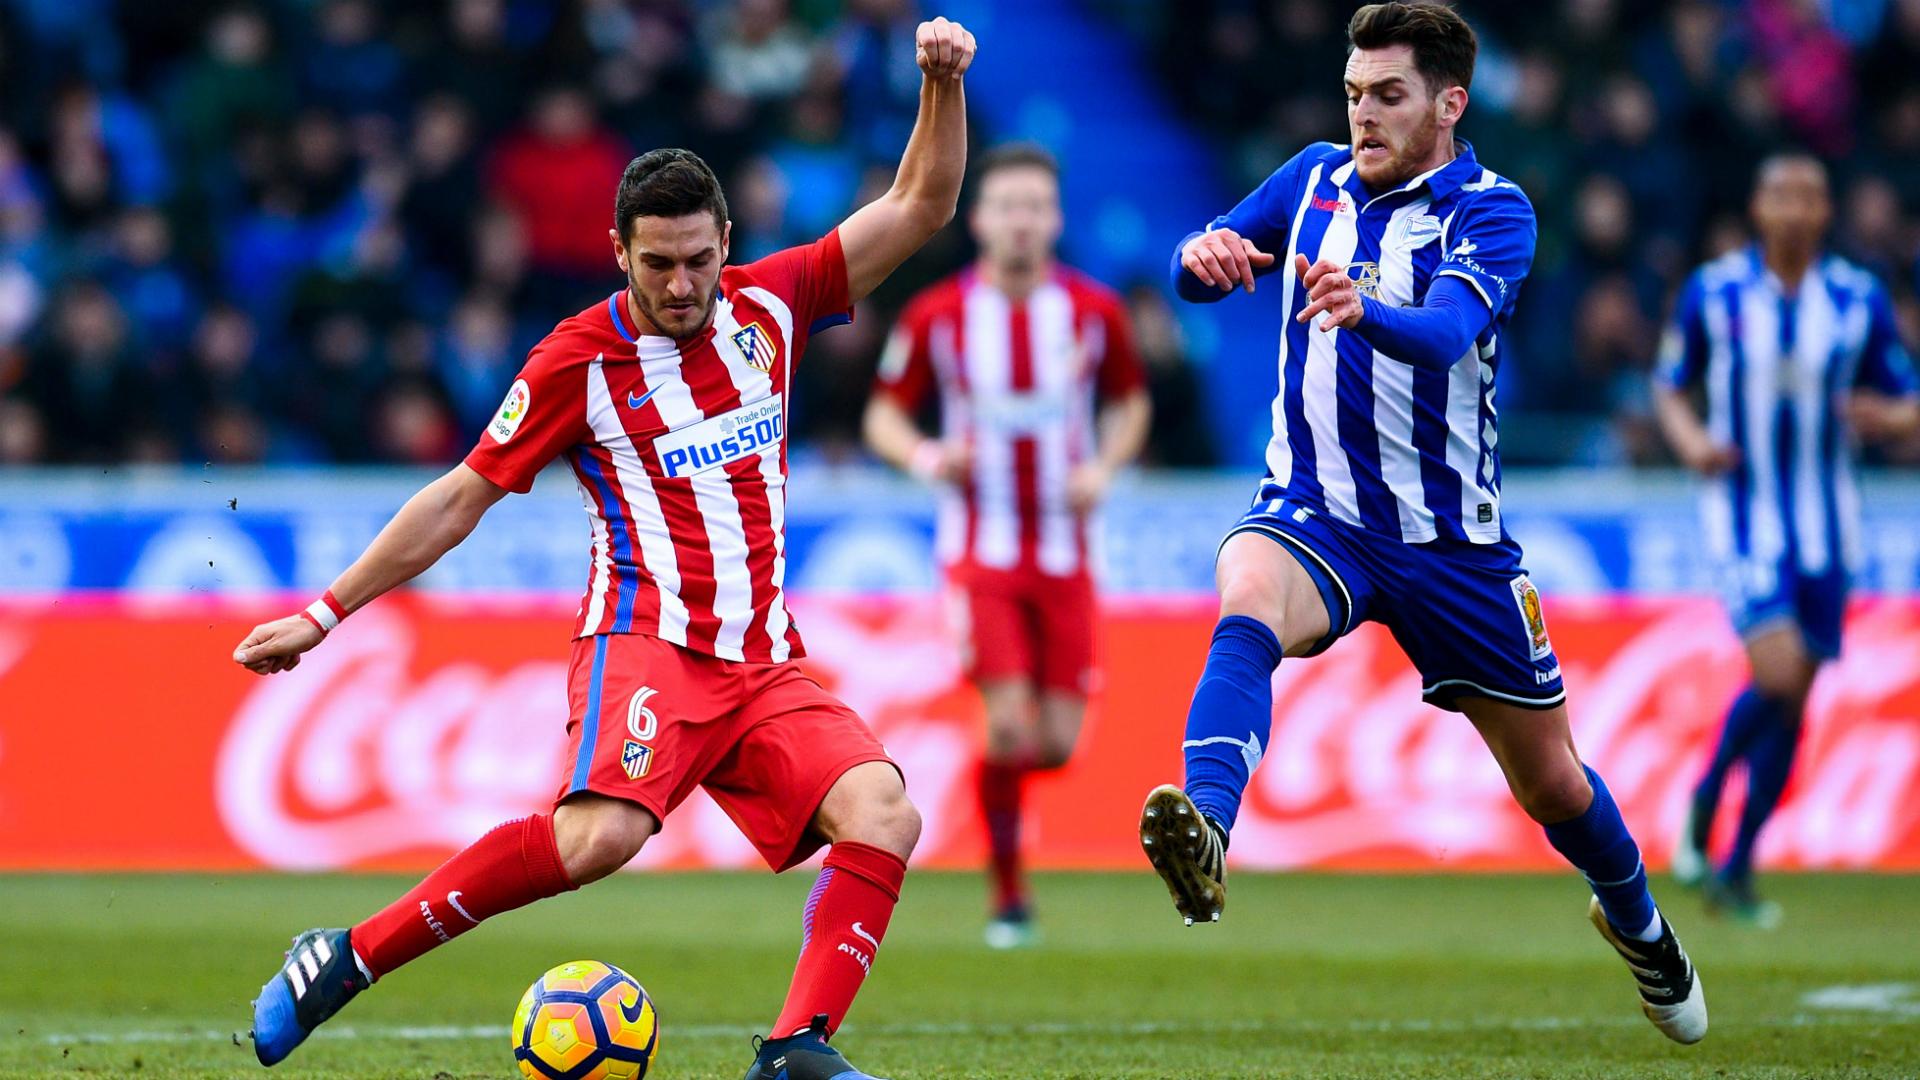 Atletico Madrid vs Deportivo Alaves: Prediction, Lineups, Team News, Betting Tips & Match Previews